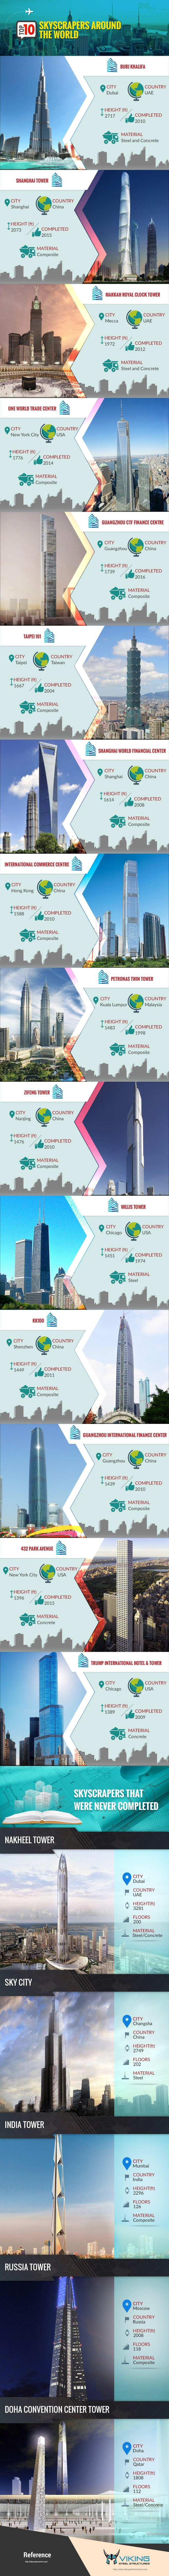 Top 10 Skyscrapers Around The World